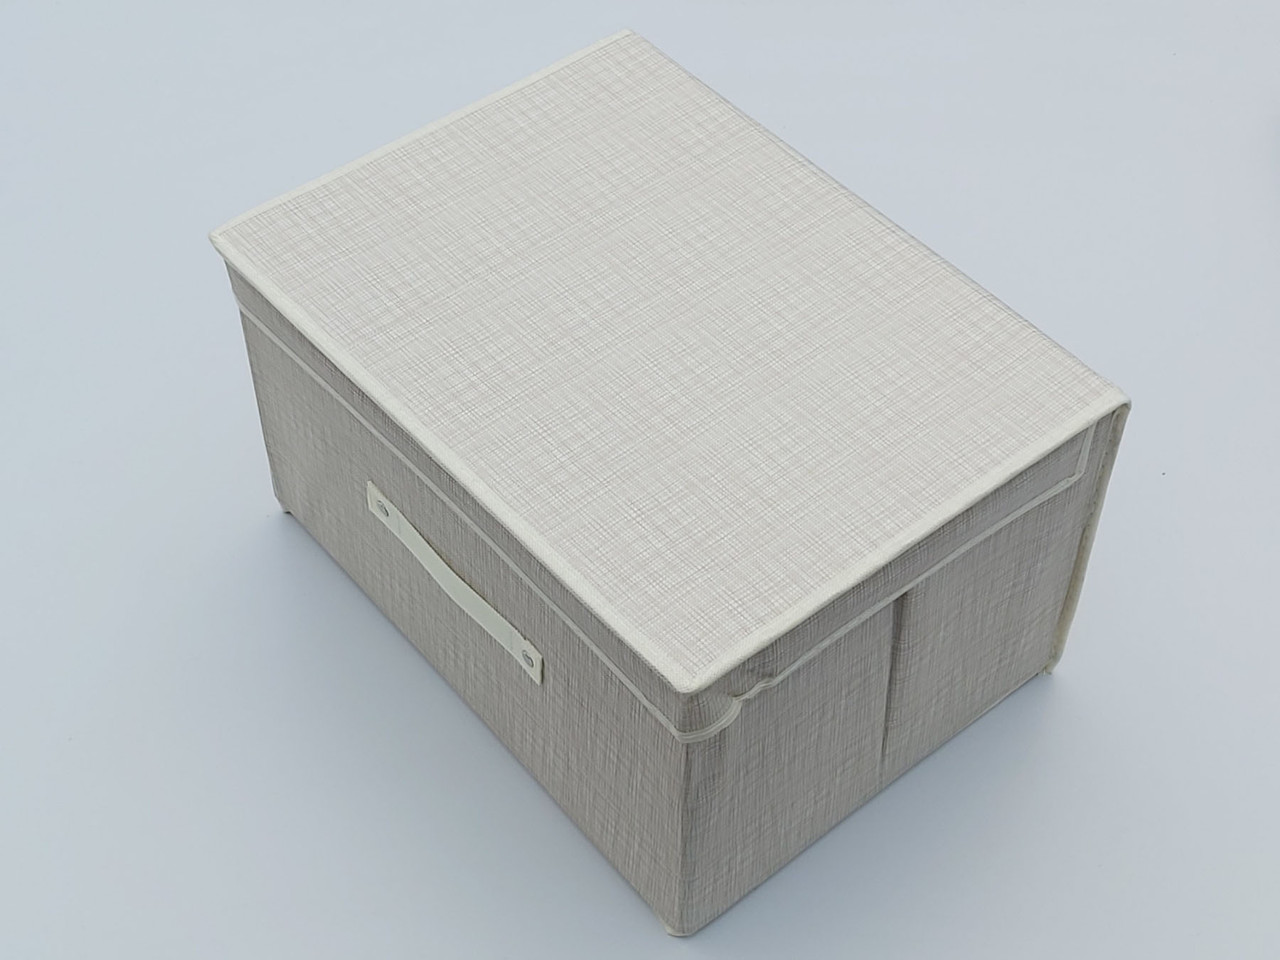 Коробка для хранения бежевого цвета